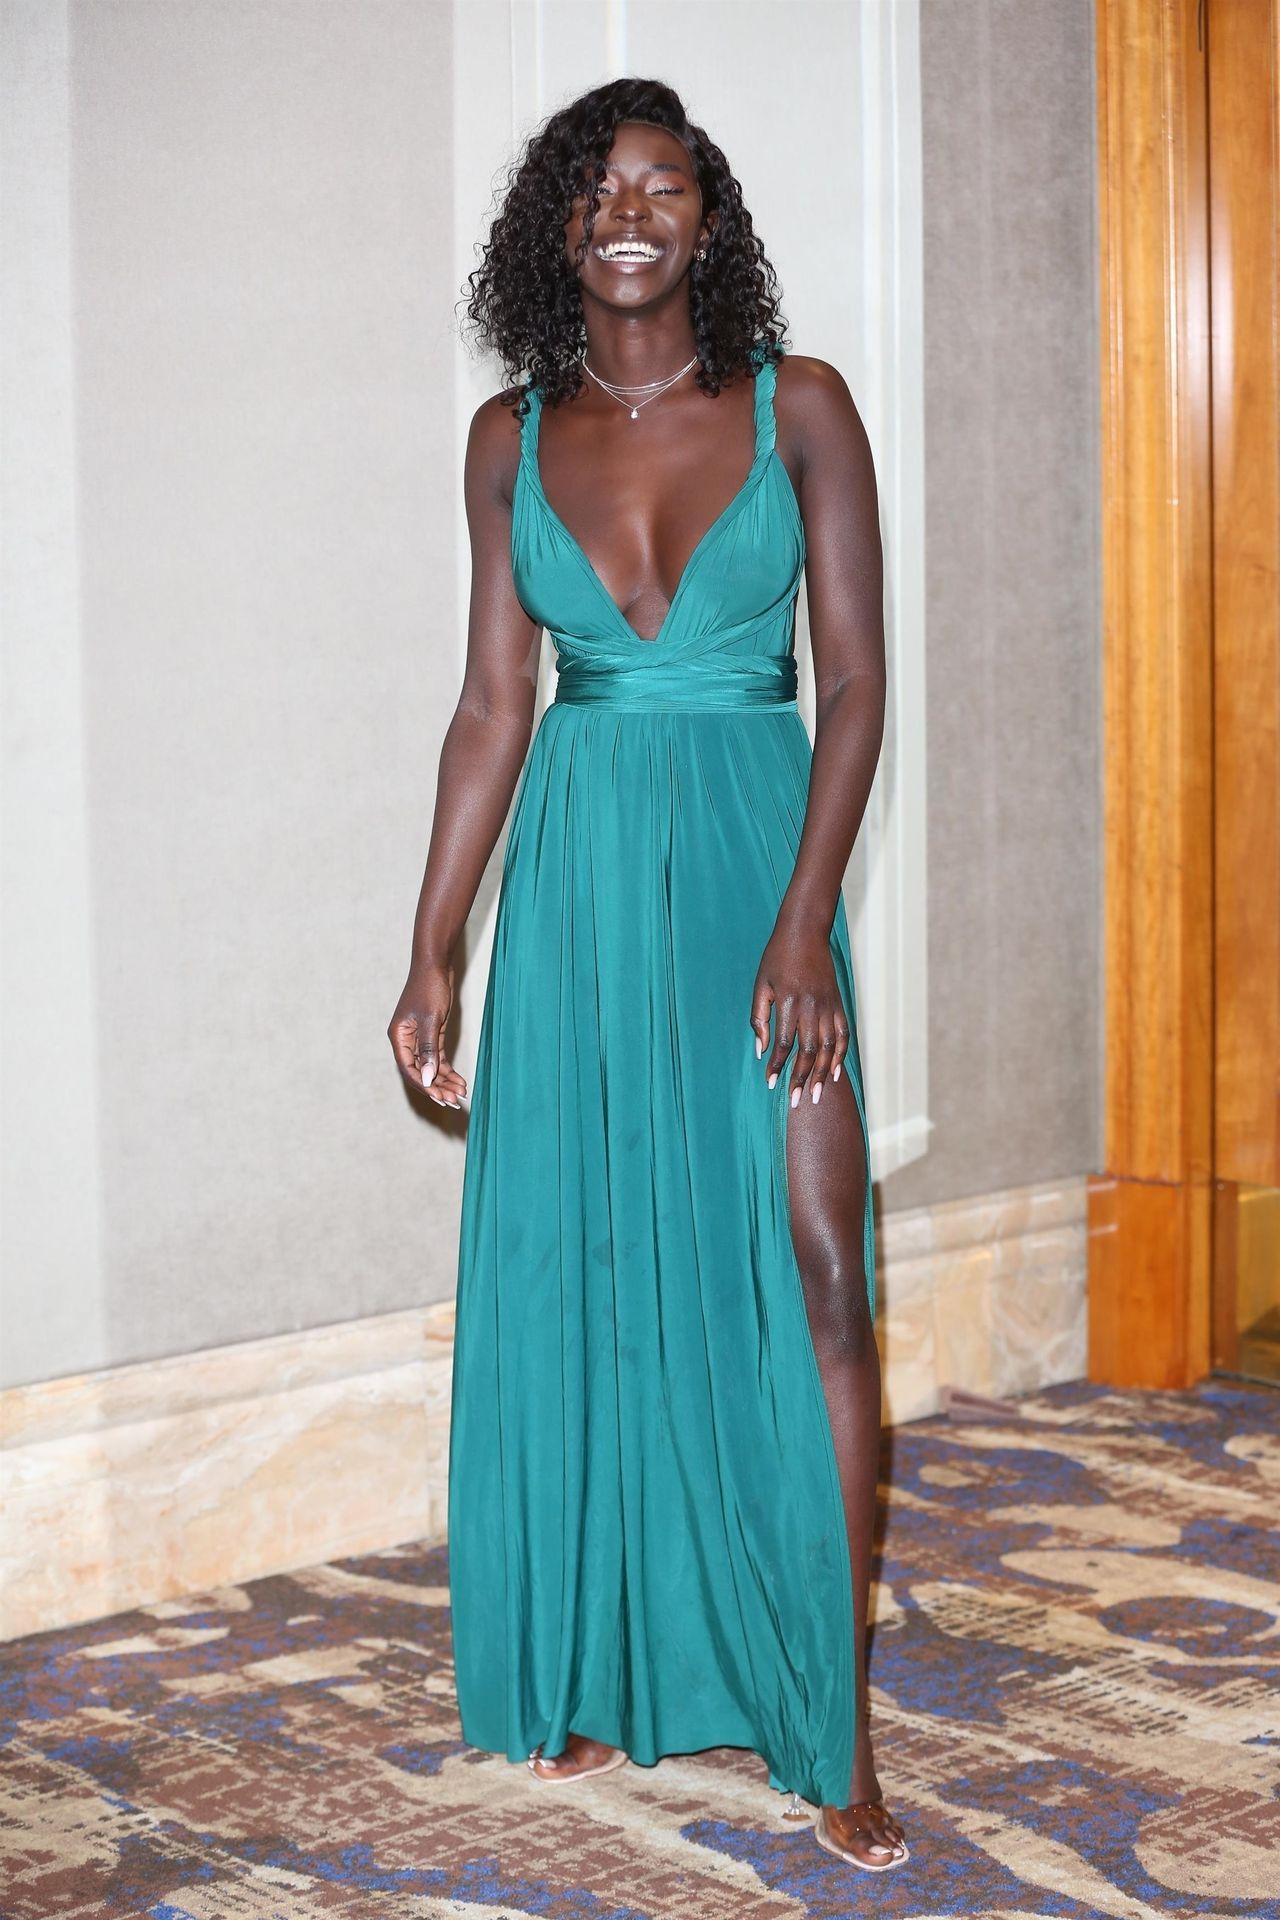 Mike Boateng & Priscilla Anyabu Are Seen At British Ethnic Diversity Sports Awards 0157